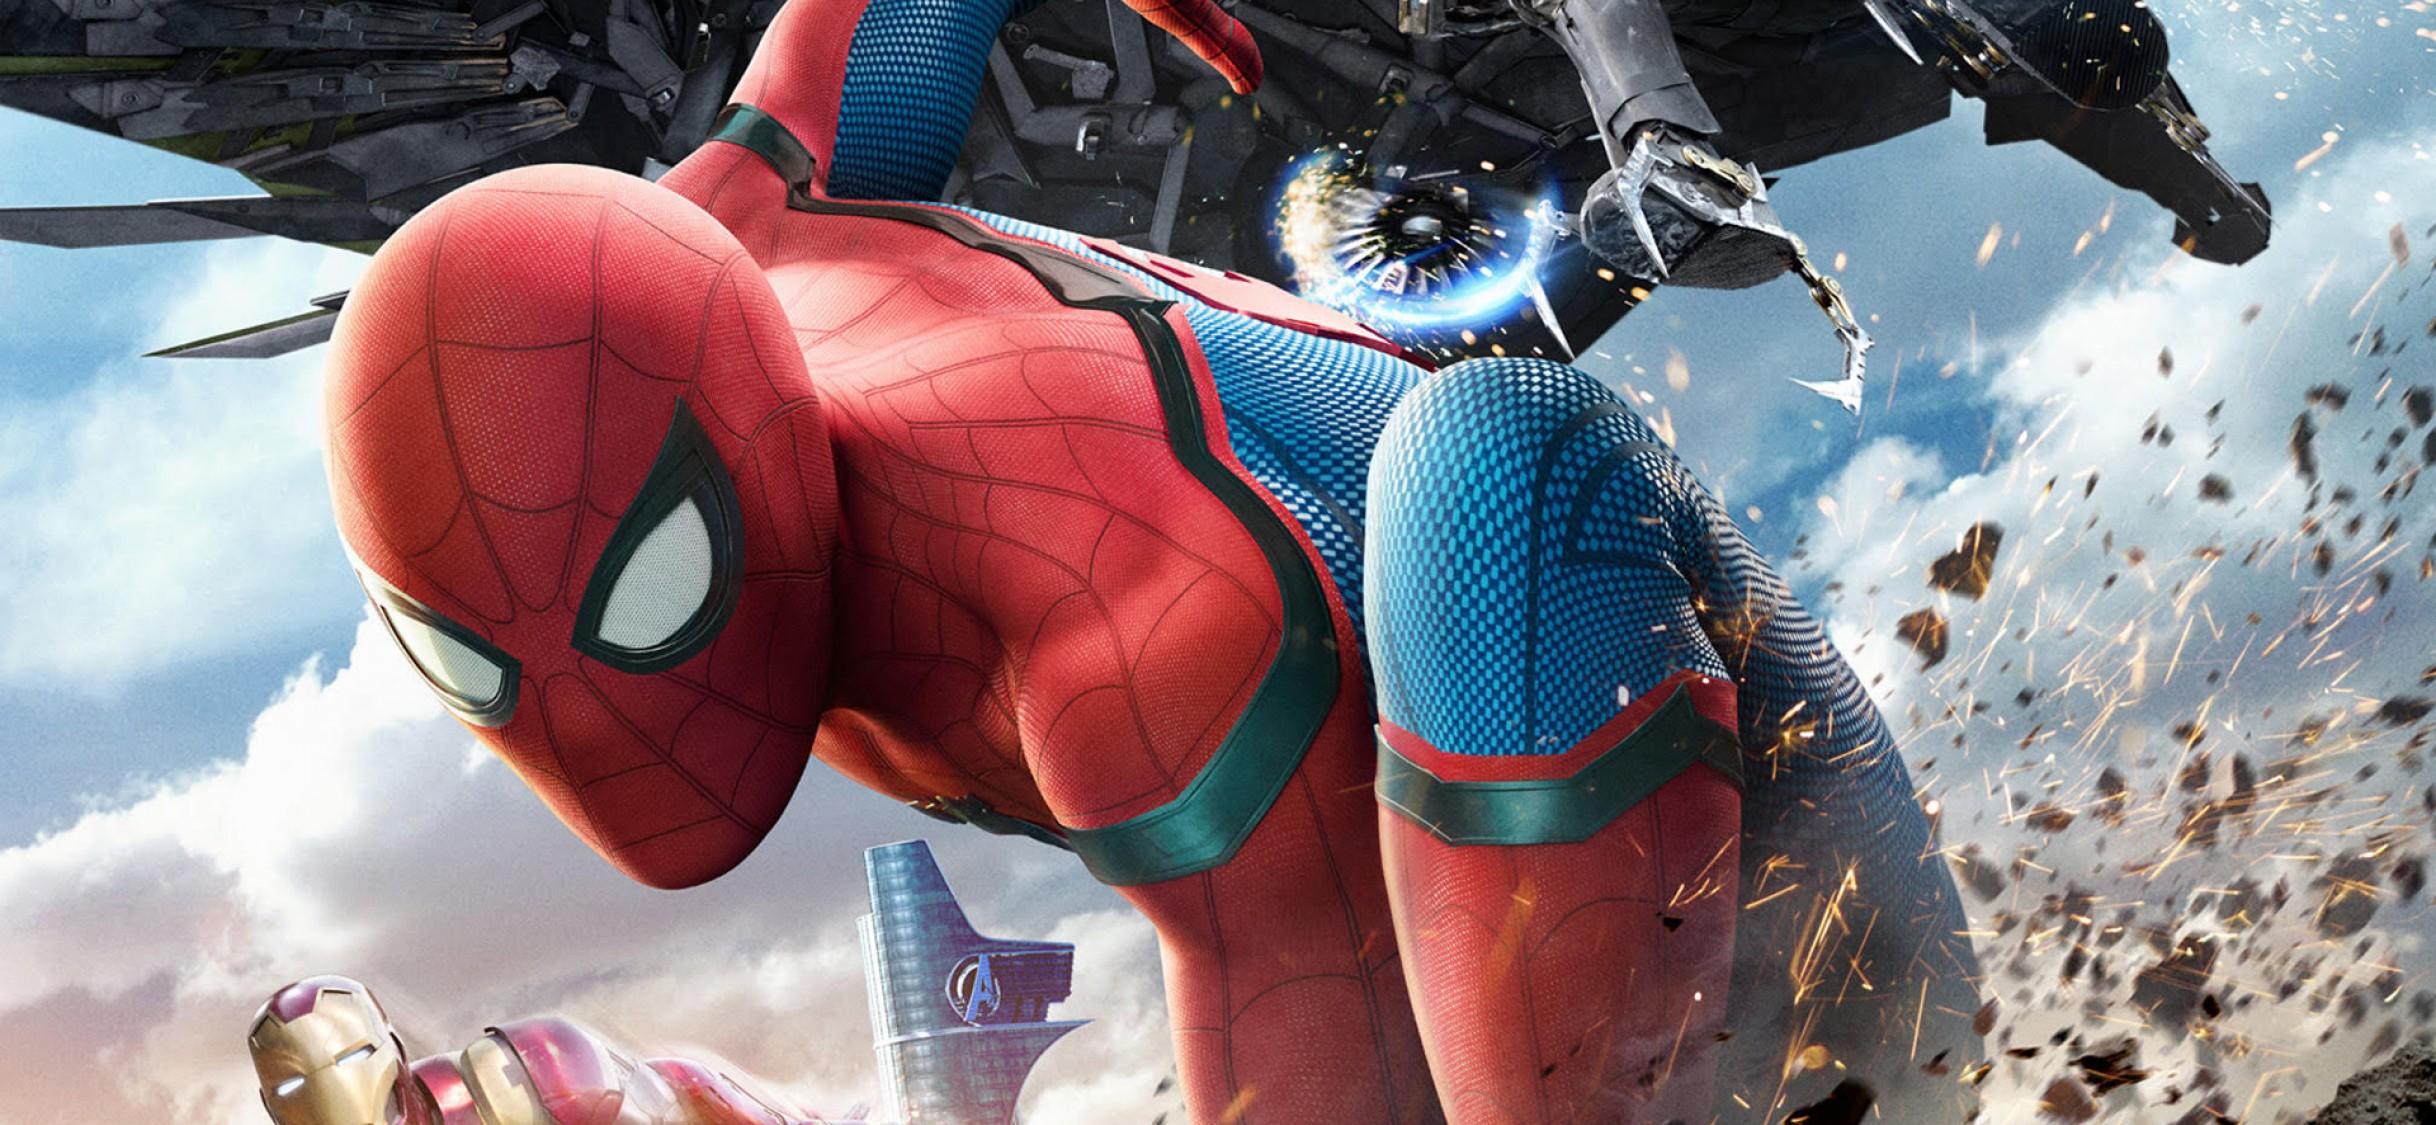 Spiderman Homecoming 4k Full Hd Wallpaper For Desktop And Mobiles